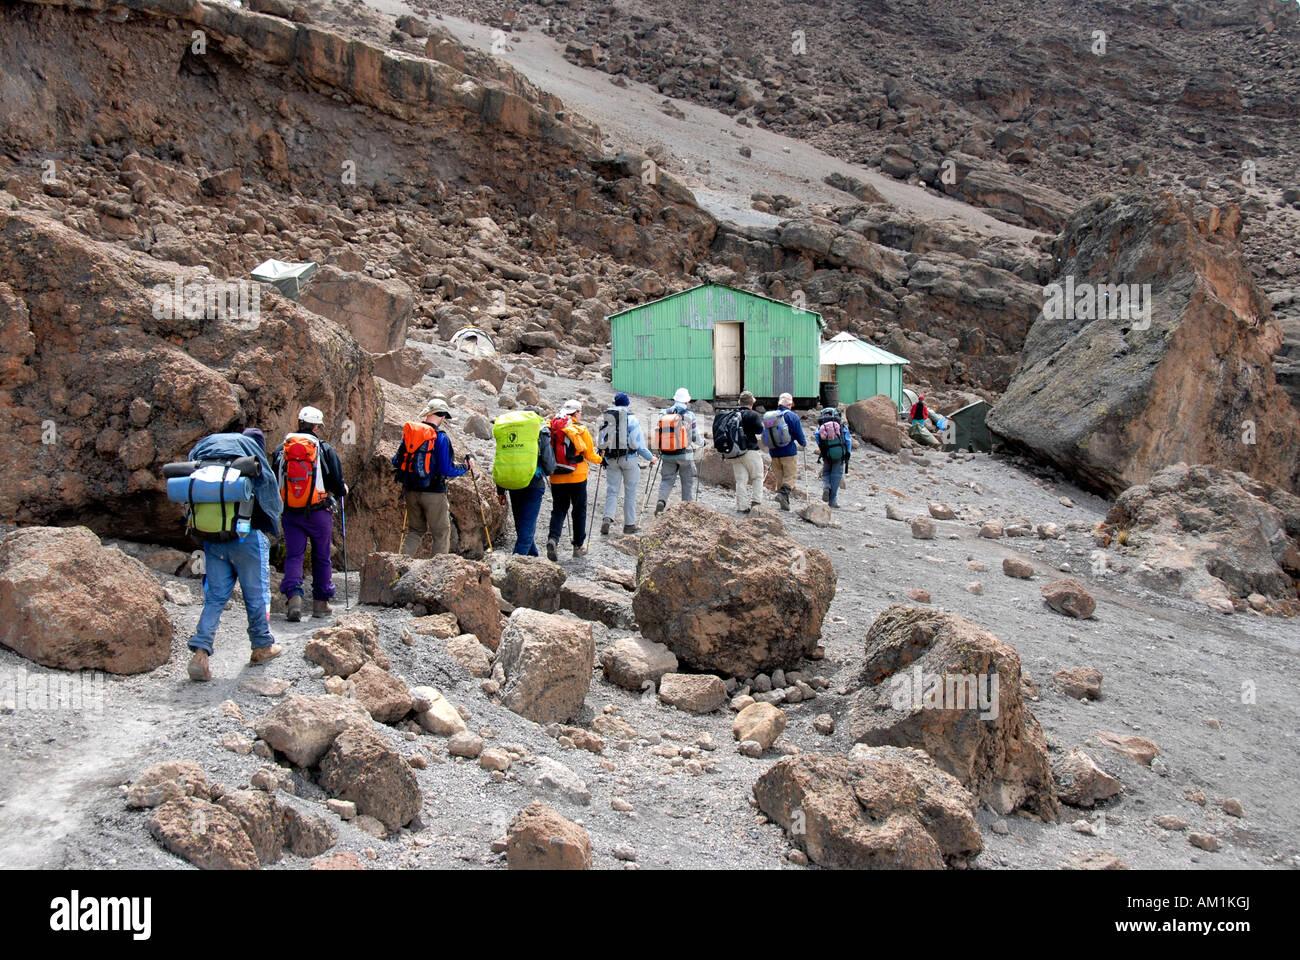 Group of trekkers on their way to School Hut Kikelewa Route Kilimanjaro Tanzania - Stock Image